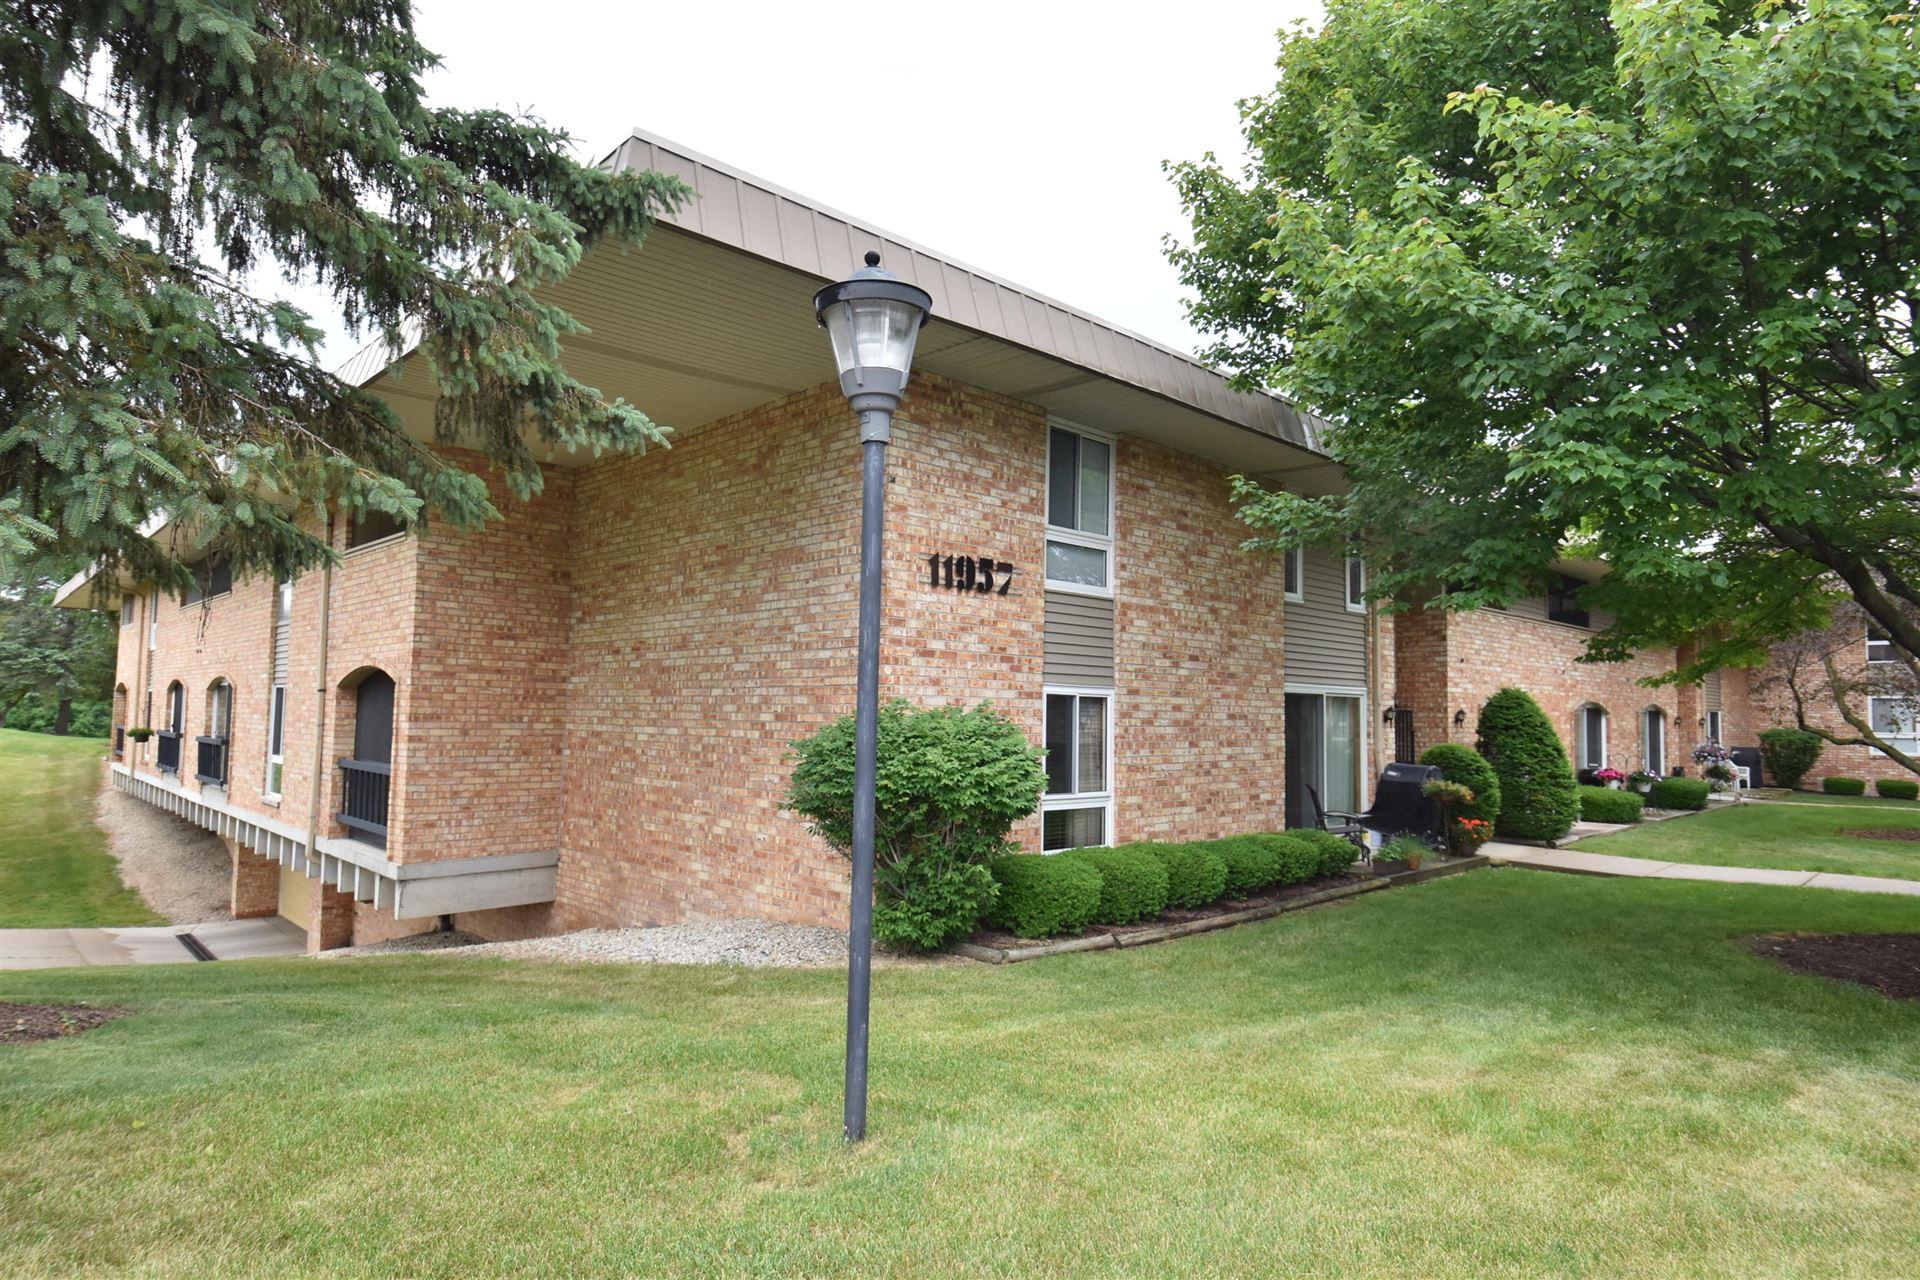 11957 W Appleton Ave #10, Milwaukee, WI 53224 - #: 1695142